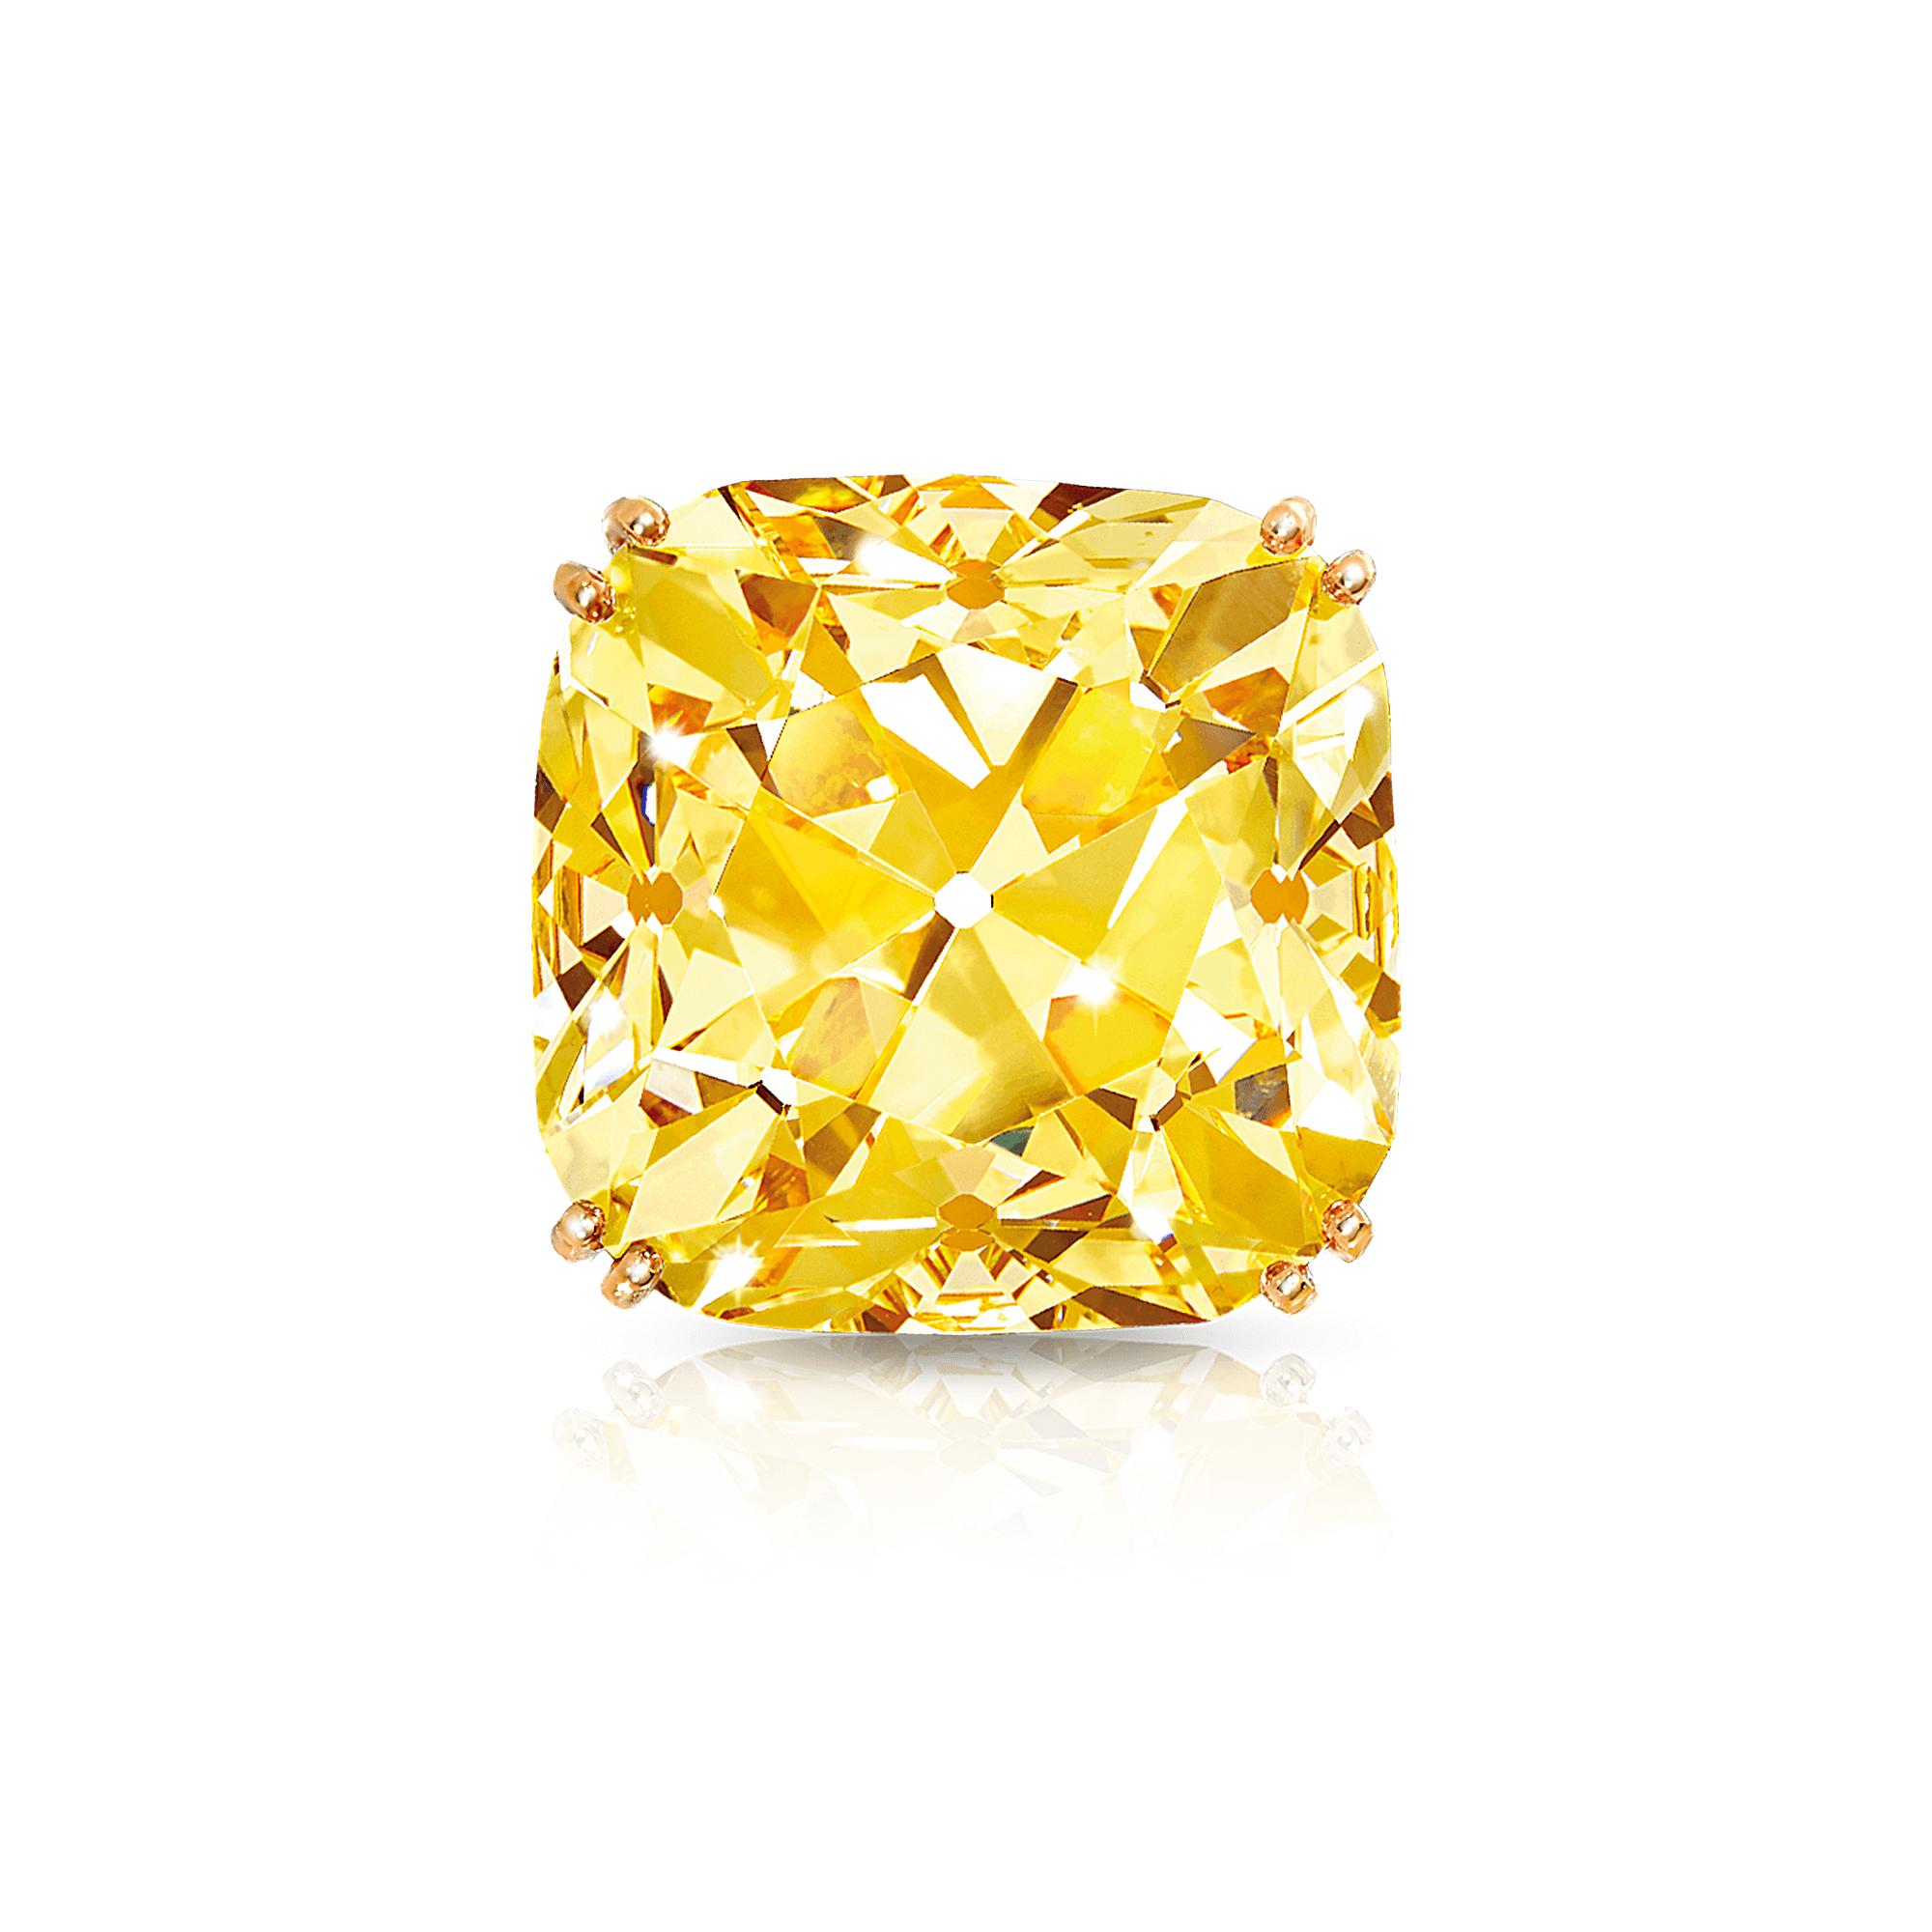 The Graff Sunflower famous Yellow Diamond from Graff